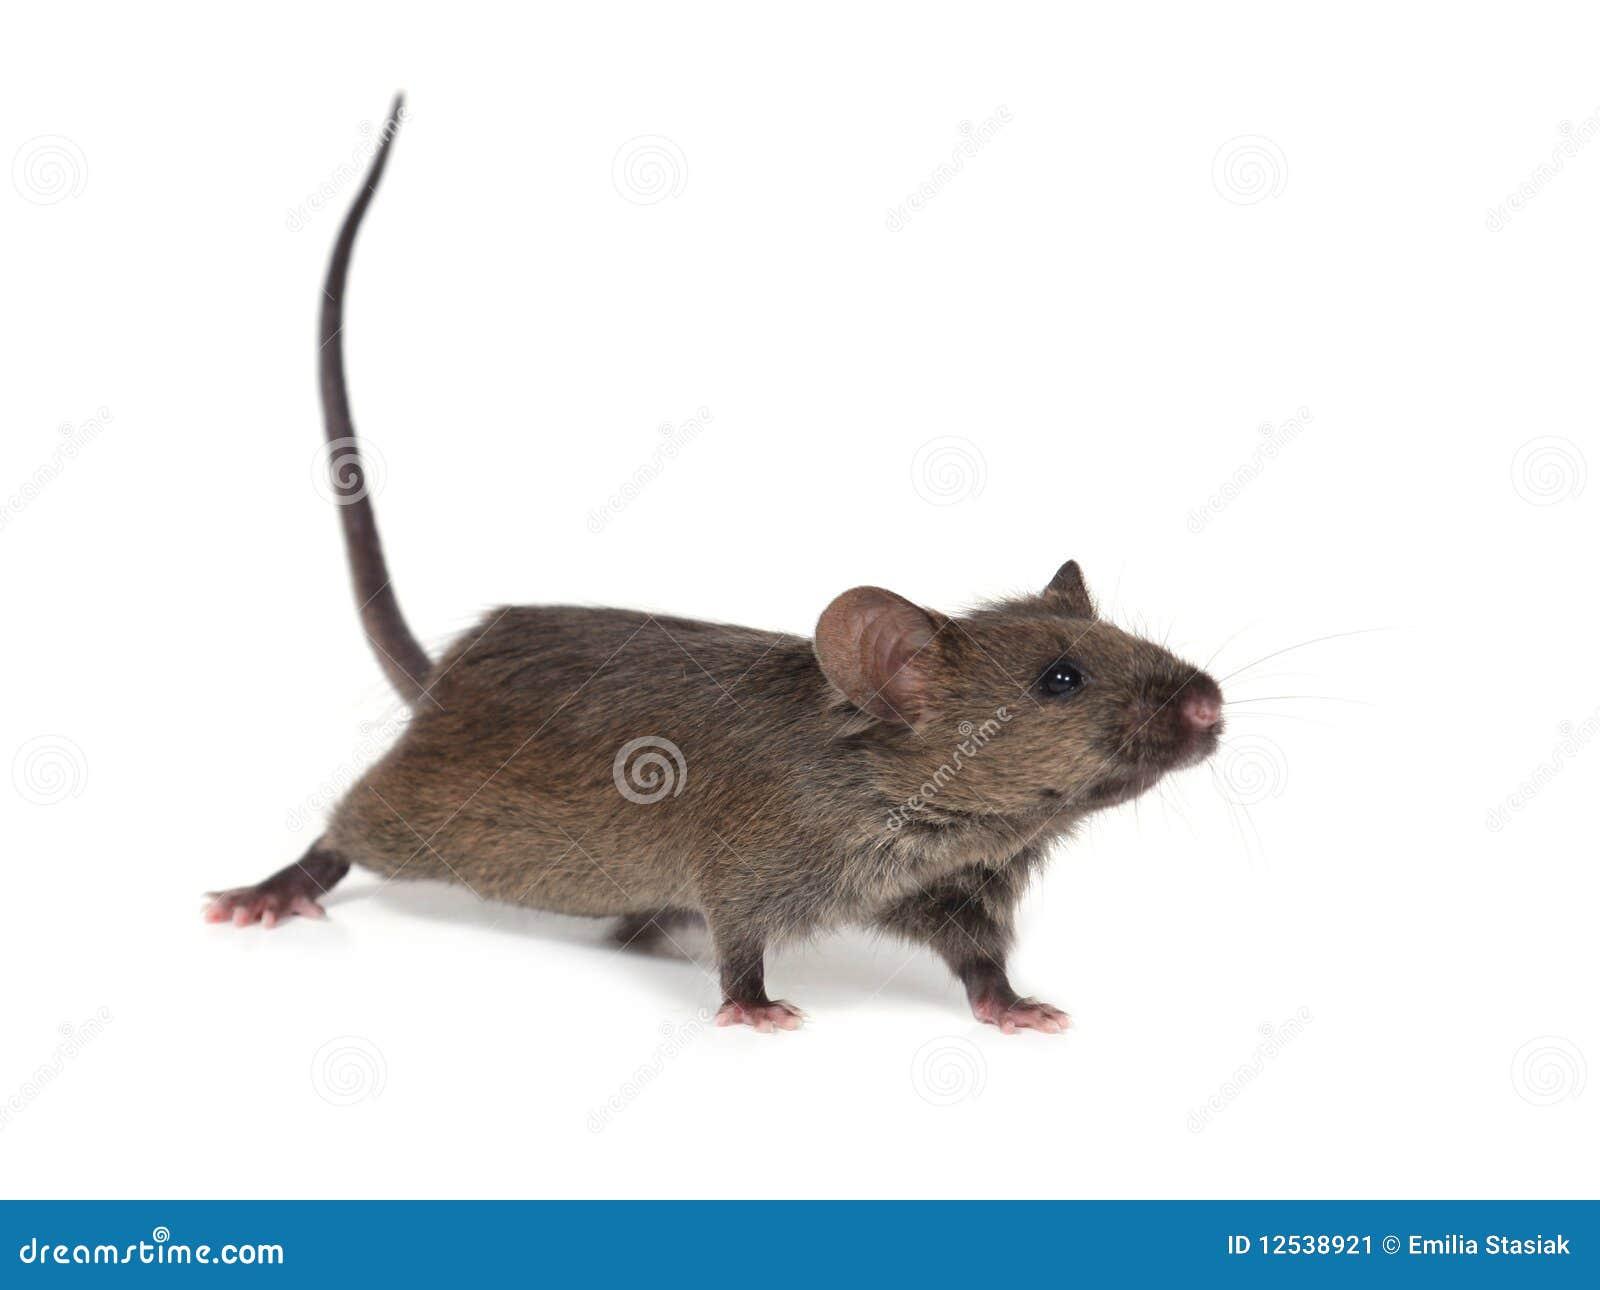 petite souris sauvage image stock image du blanc mignon 12538921. Black Bedroom Furniture Sets. Home Design Ideas